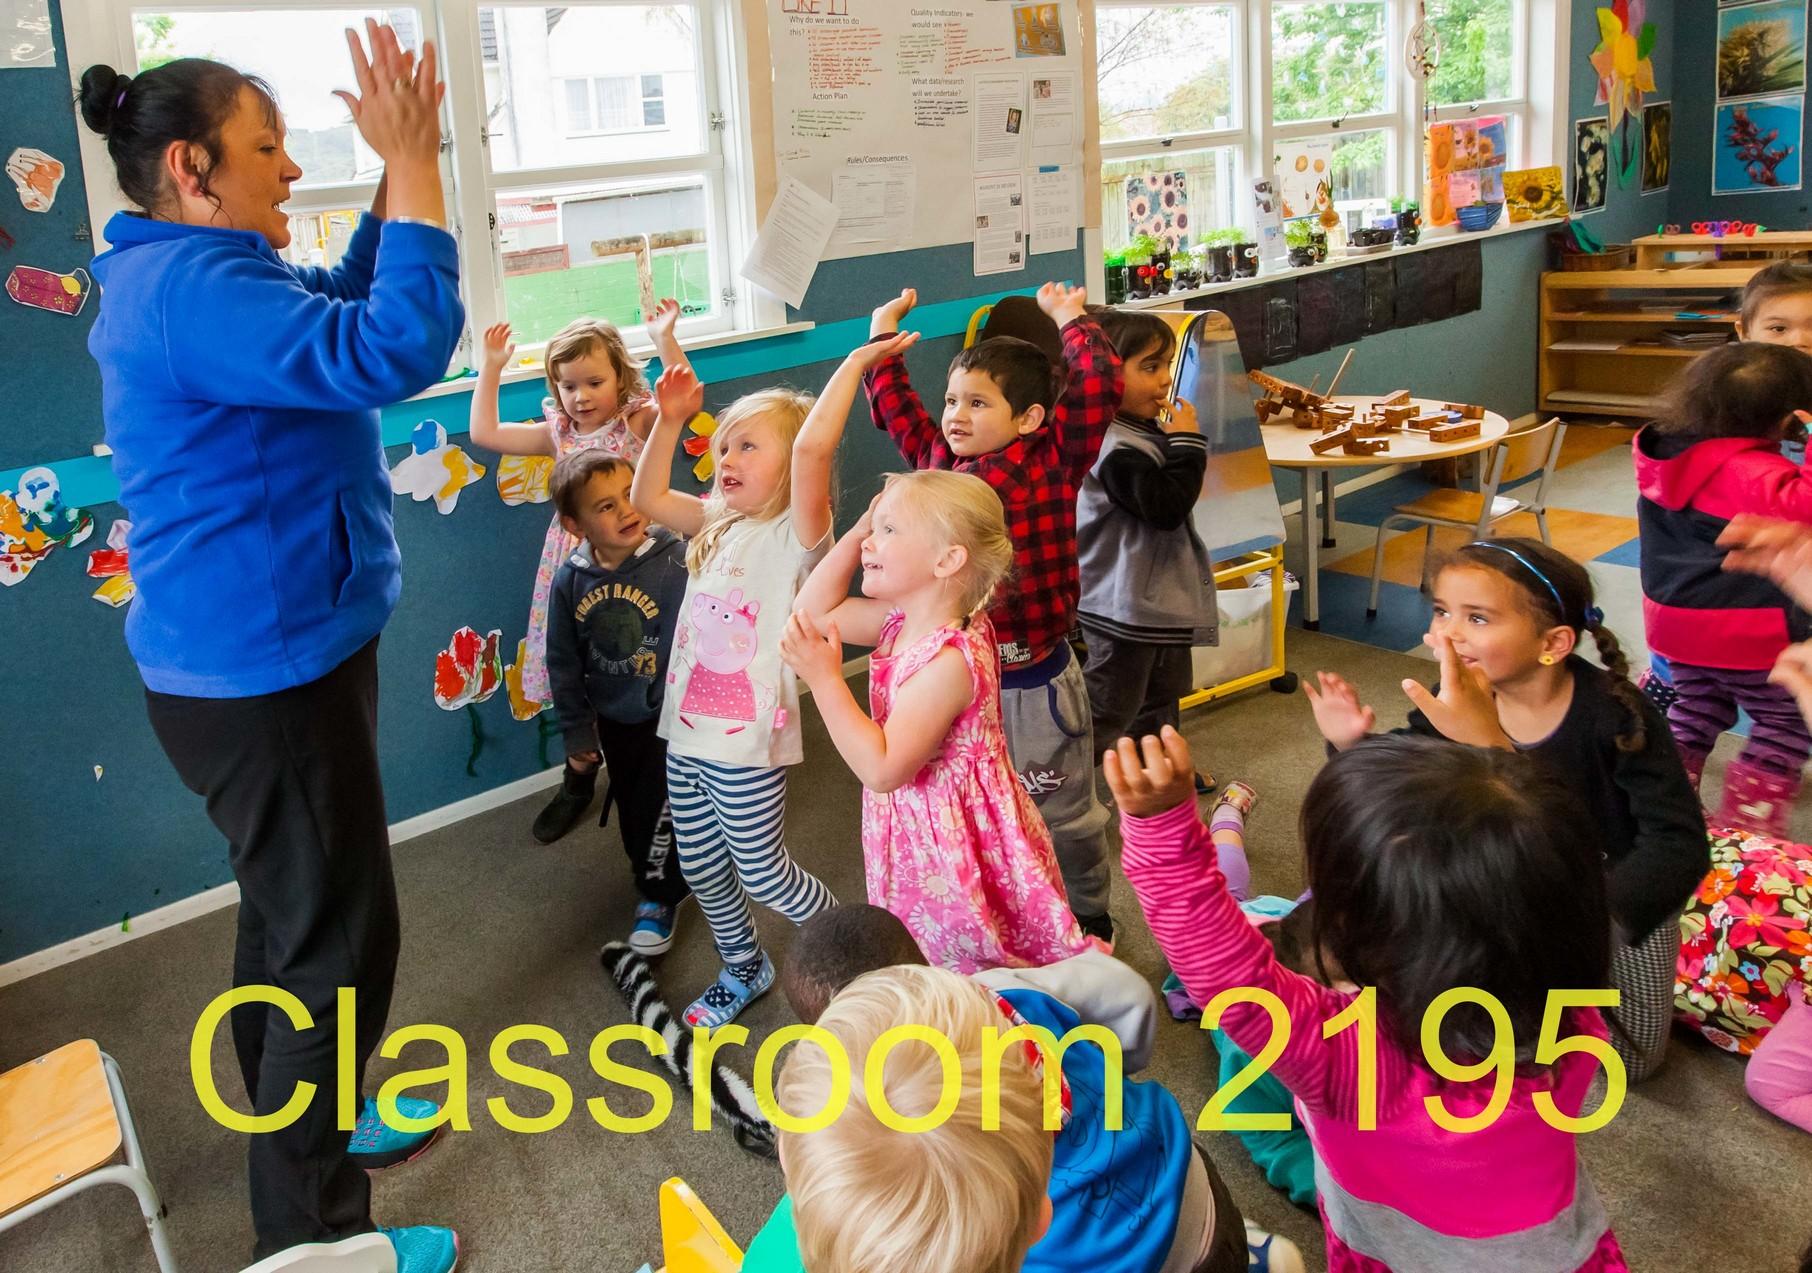 Classroom 2195